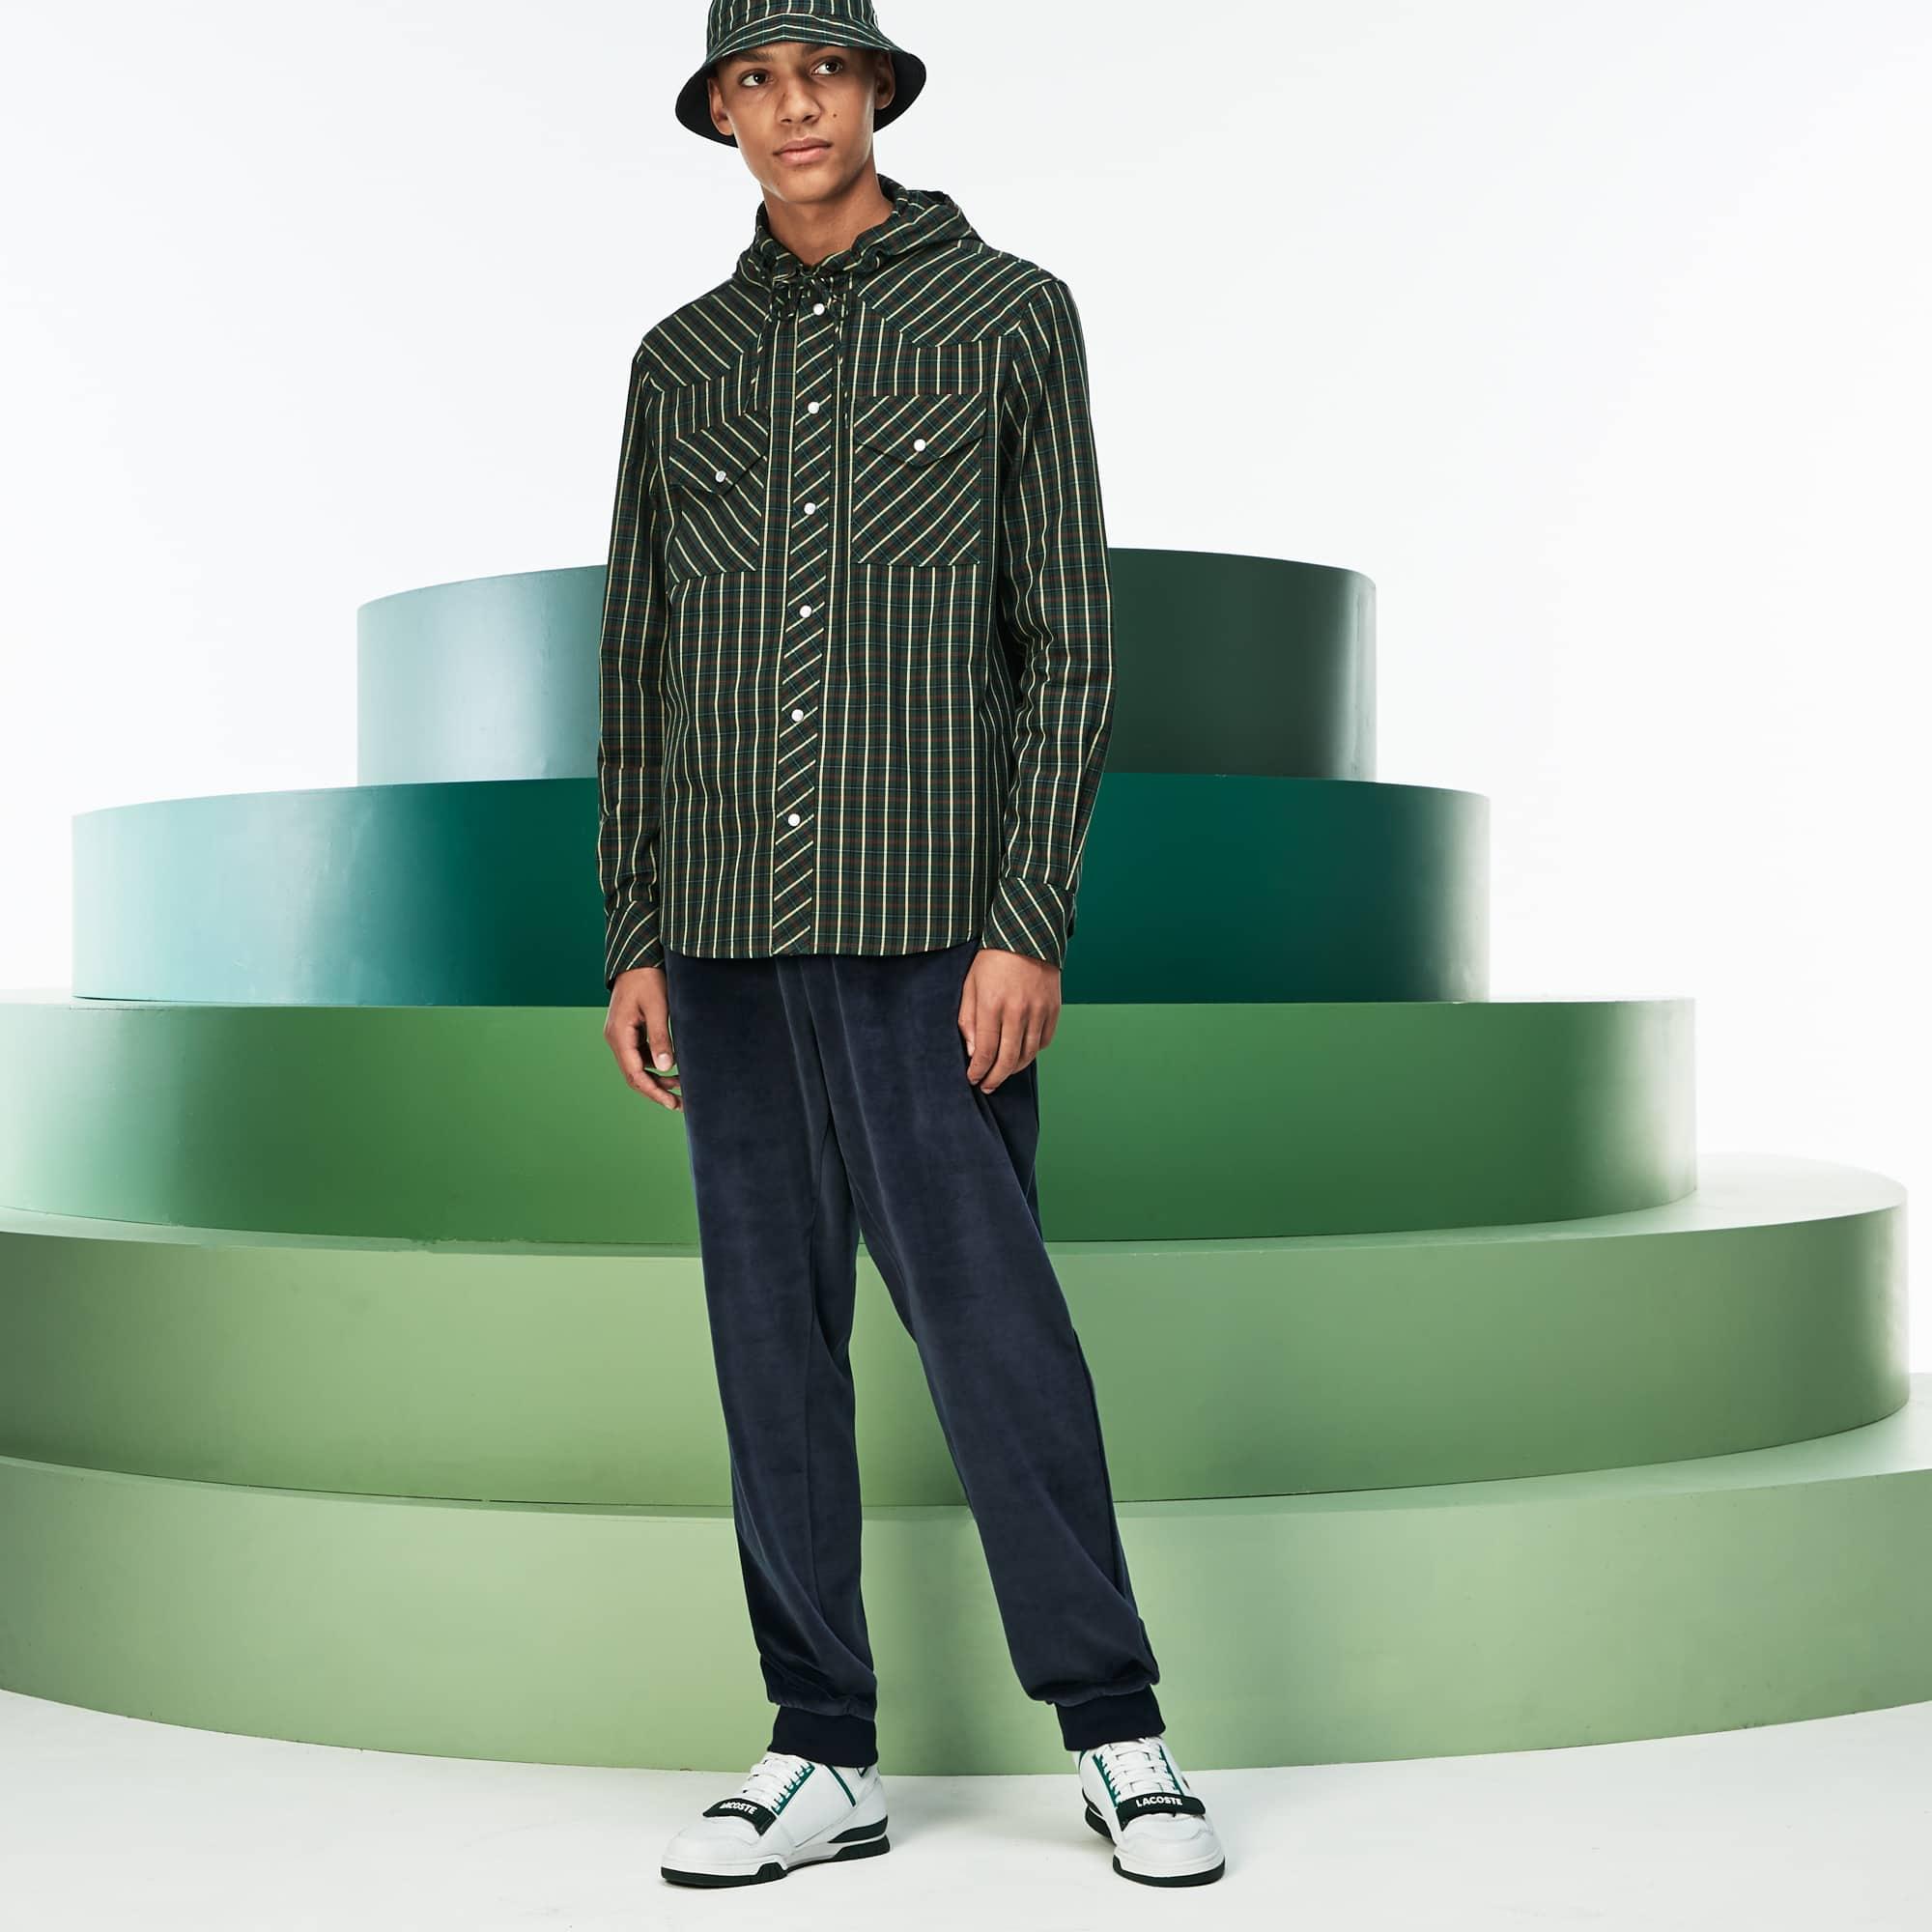 Men's Fashion Show Quilted Velour Sweatpants